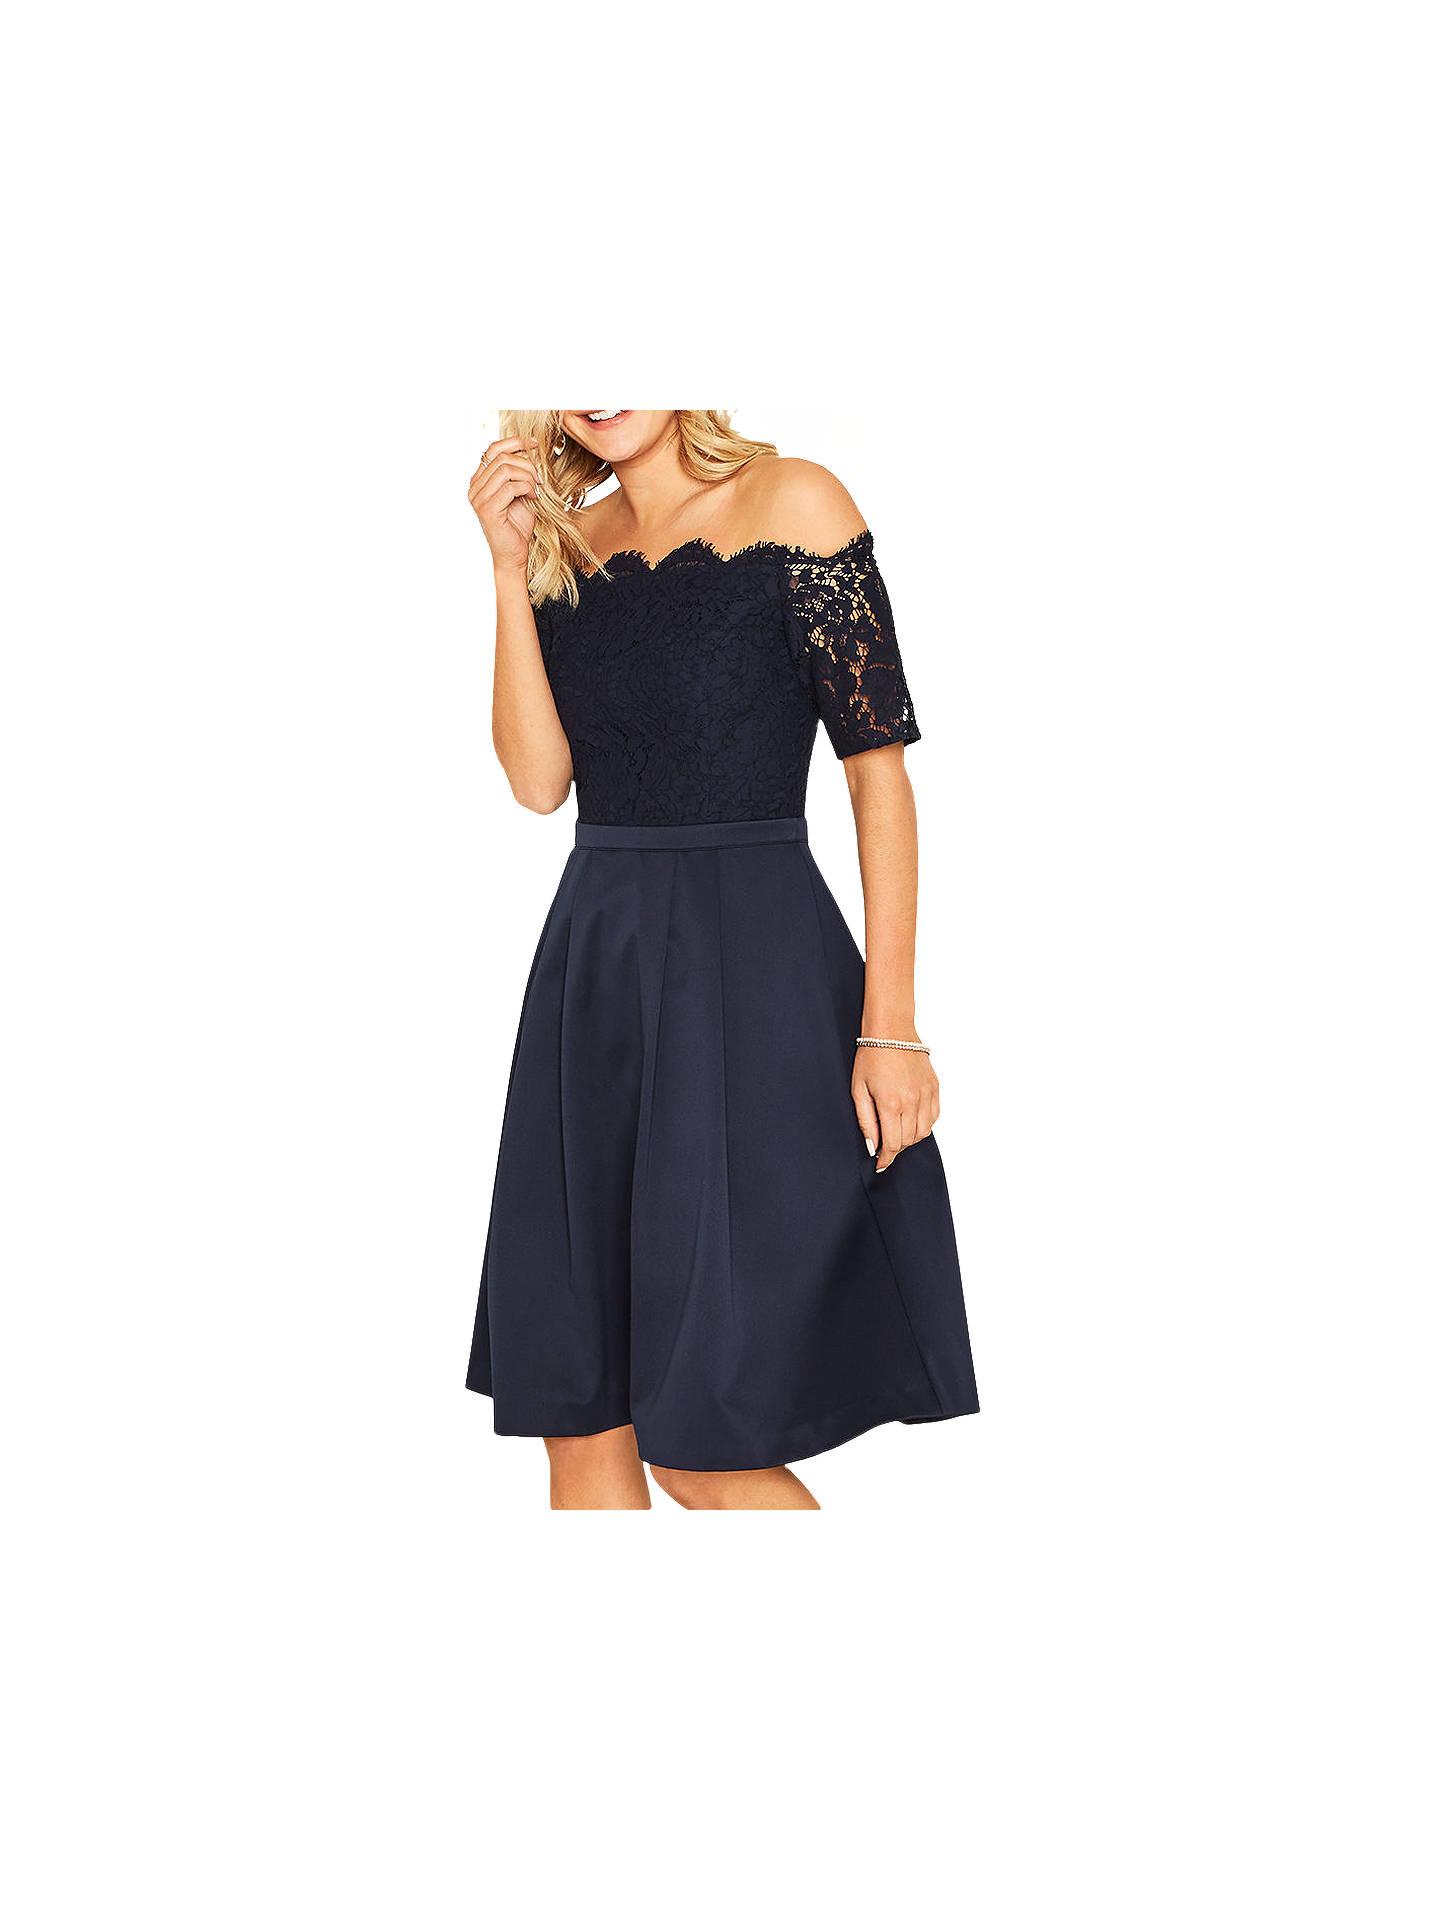 72e3fa7b8bd BuyOasis Lace Top Bardot 2 in 1 Skater Dress